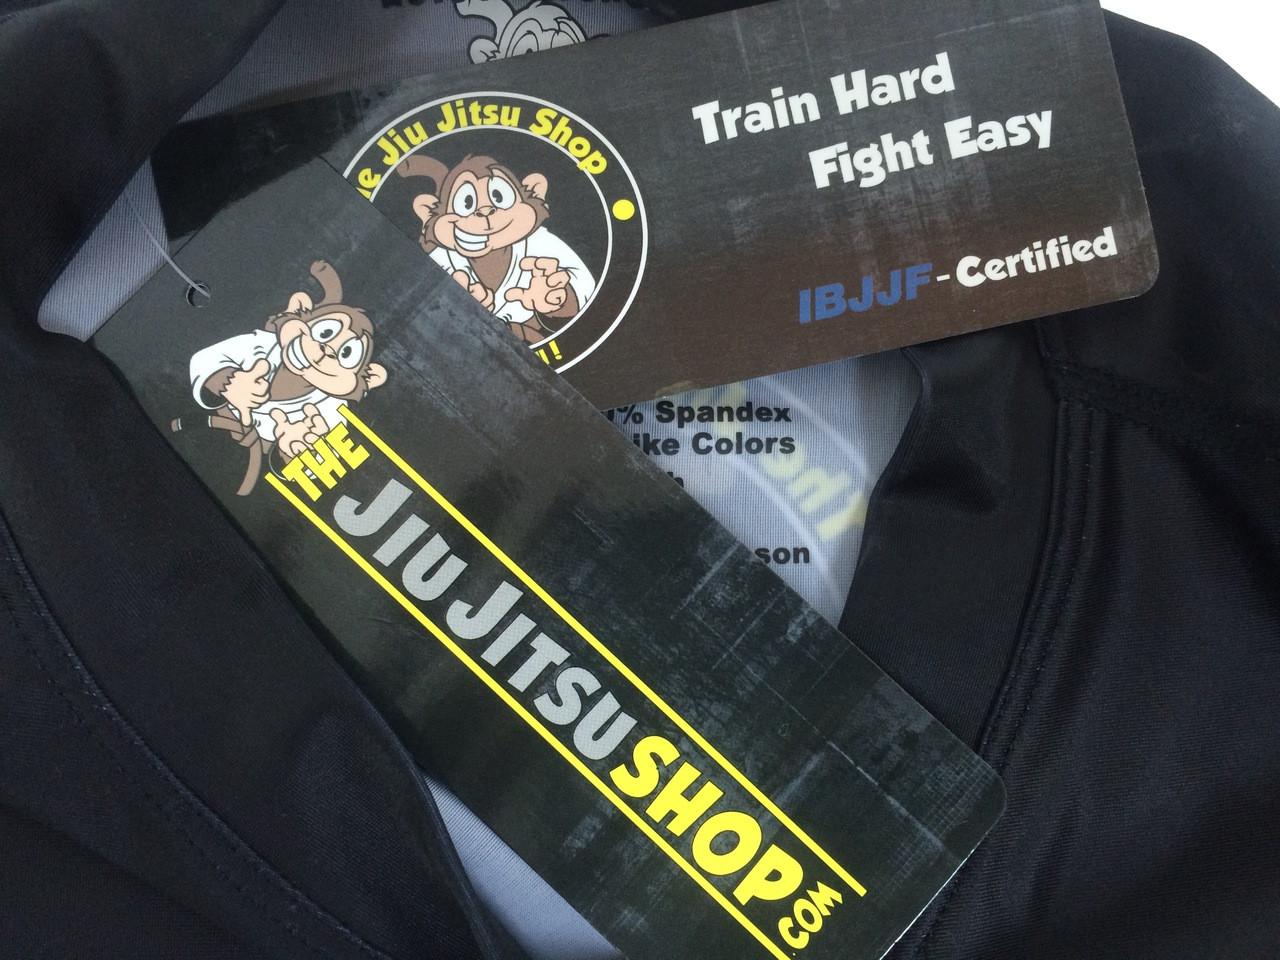 "The Jiu Jitsu Shop's ""Essentials"" Long Sleeve Rashguard, featuring our buddy Rocky the Monkey. Exclusively by www.thejiujitsushop.com. Free domestic shipping storewide."